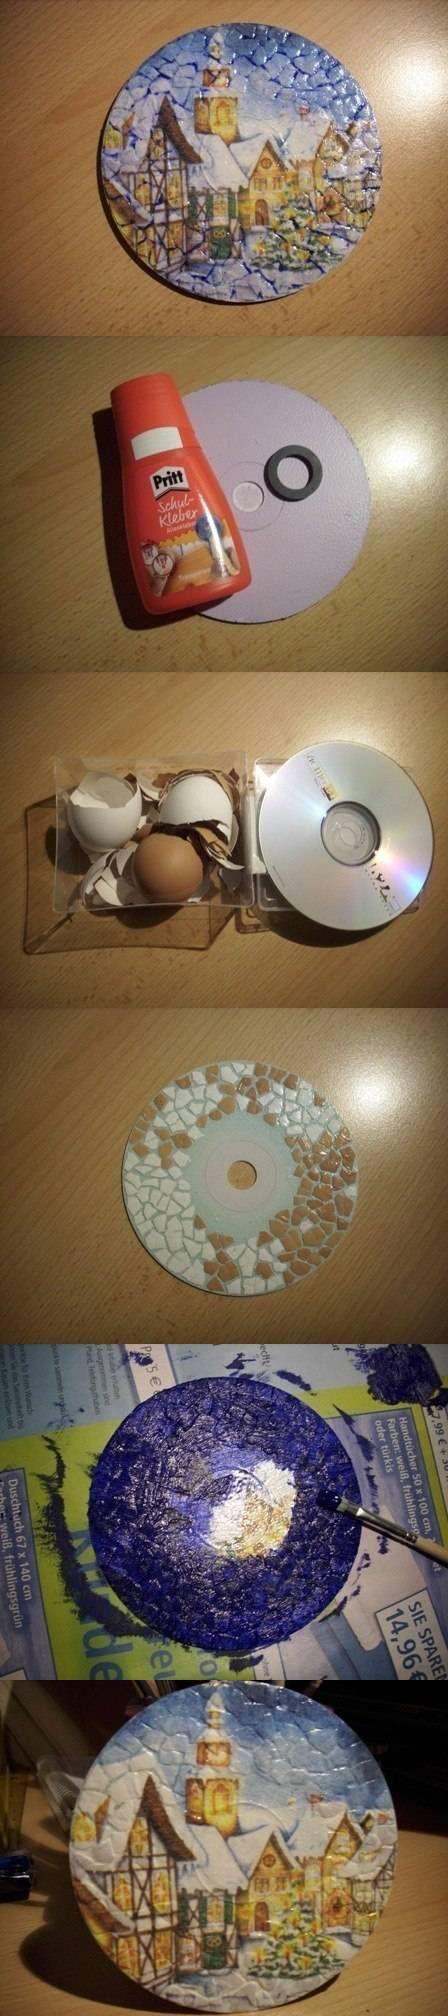 DIY Eggshell Decoupage DIY Projects / UsefulDIY.com